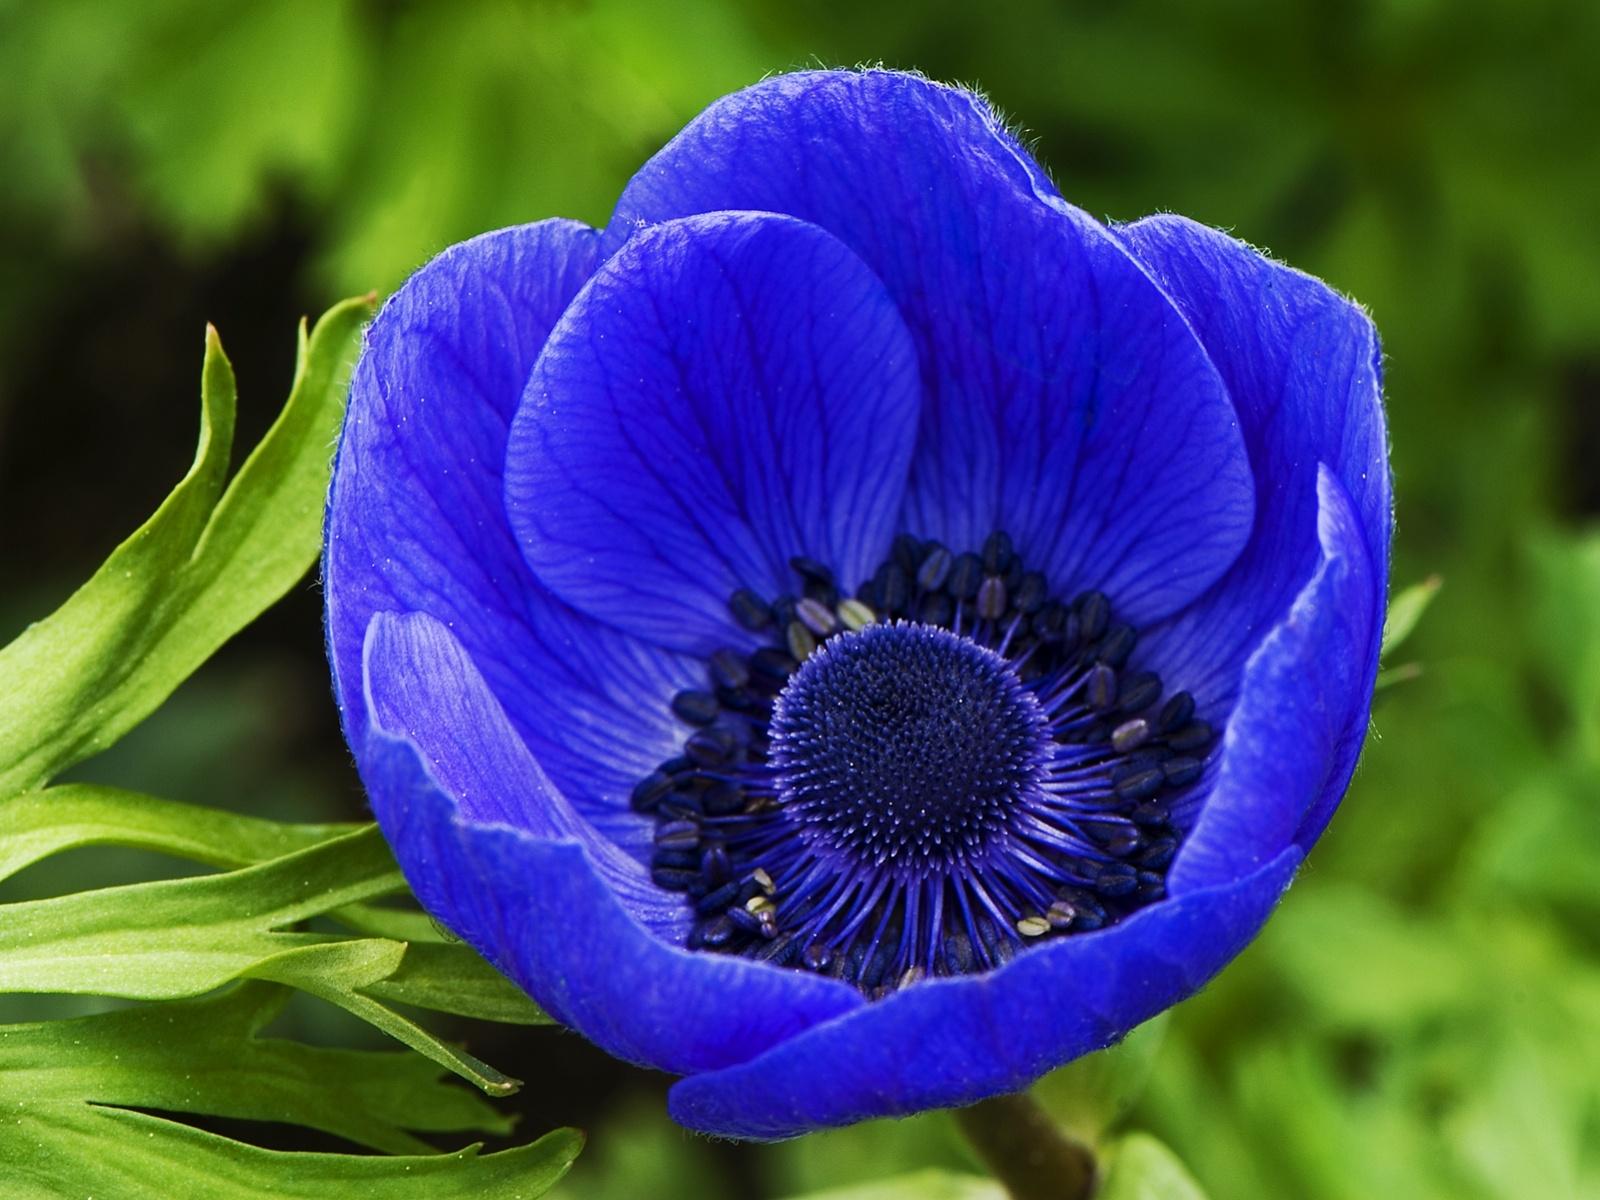 Blue flowers 70 hd wallpaper hdflowerwallpaper blue flowers widescreen wallpaper izmirmasajfo